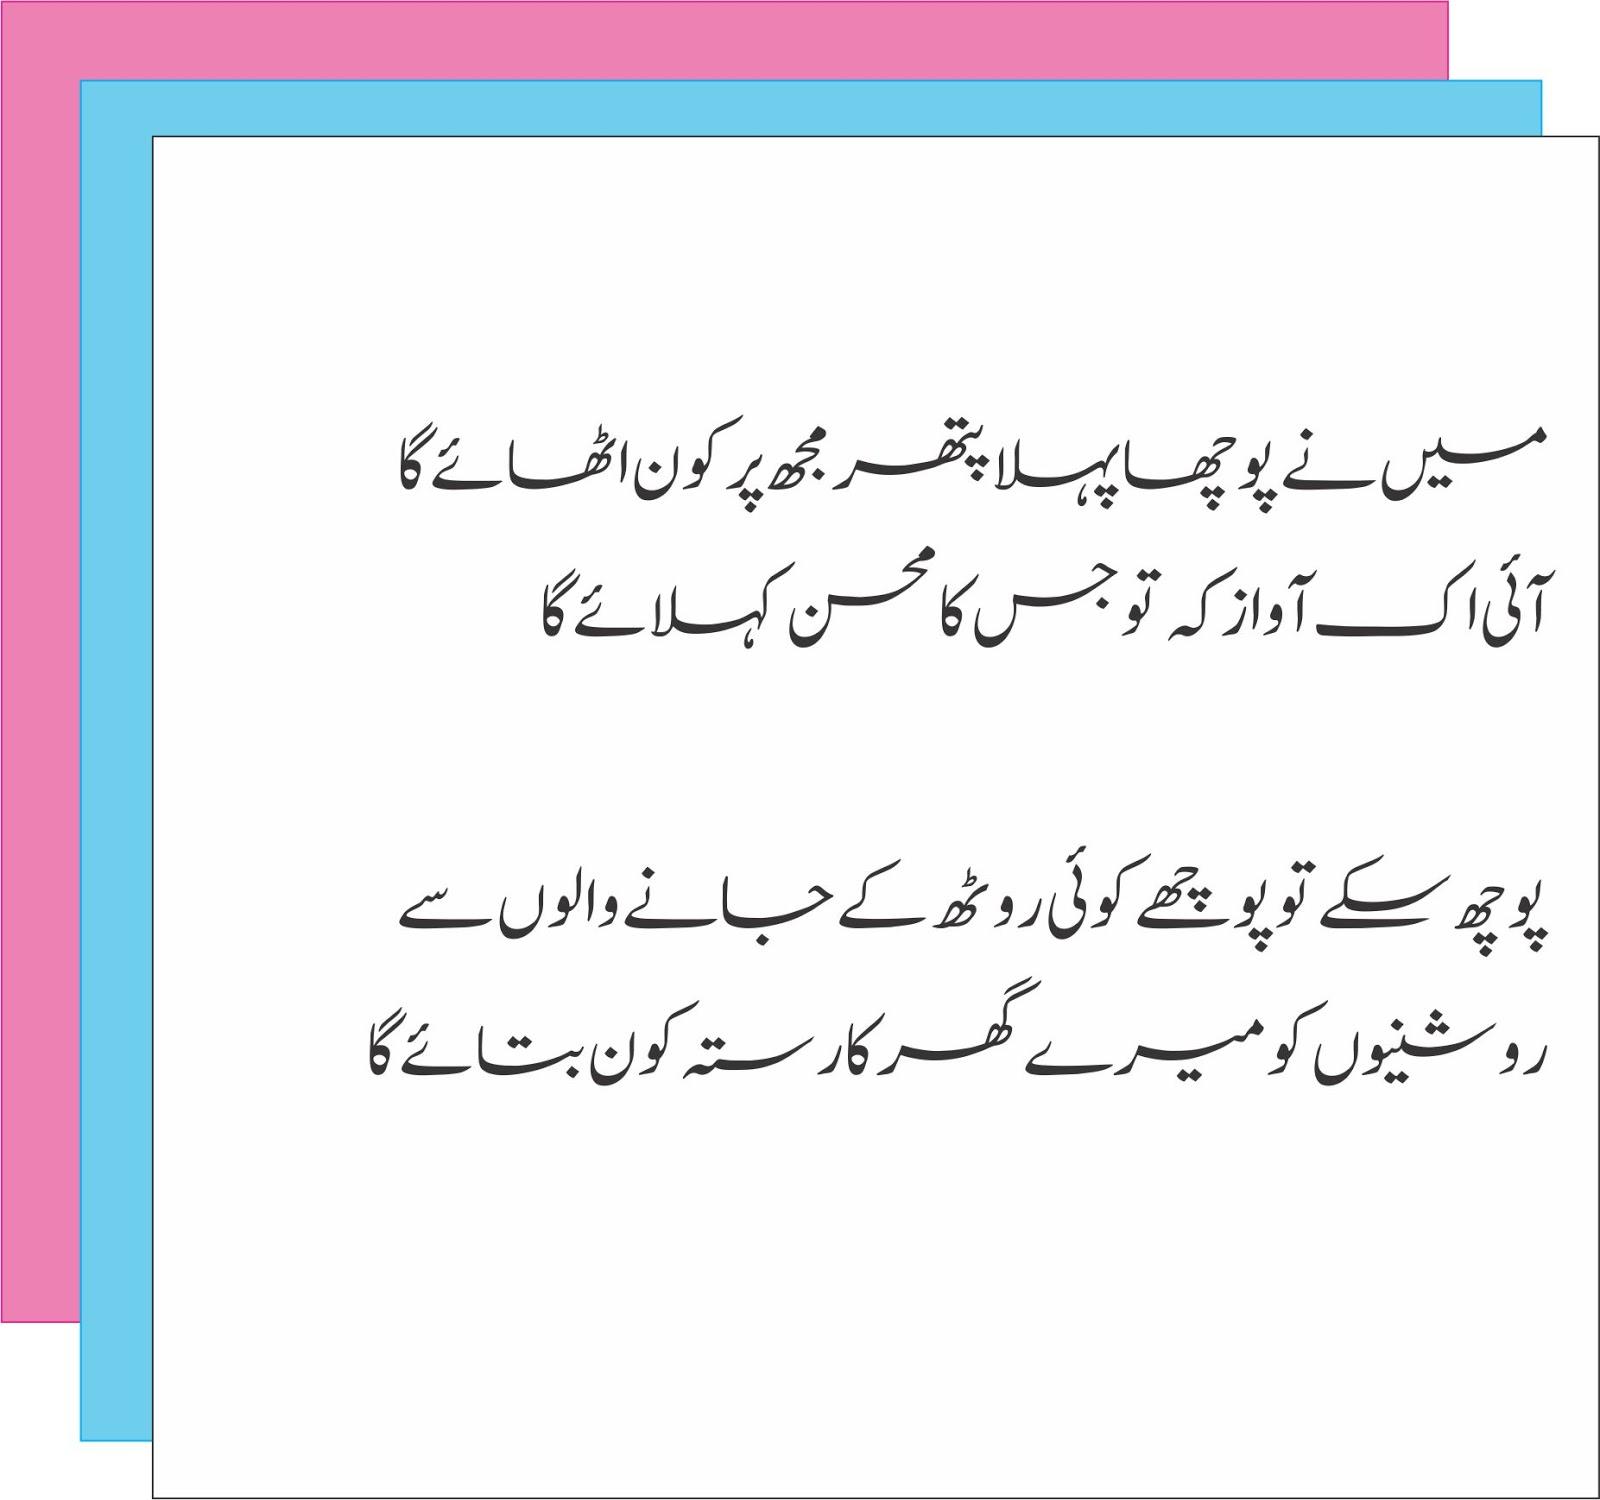 Iqbal Urdu Shayari Images: Hearted Sad Urdu Poetry